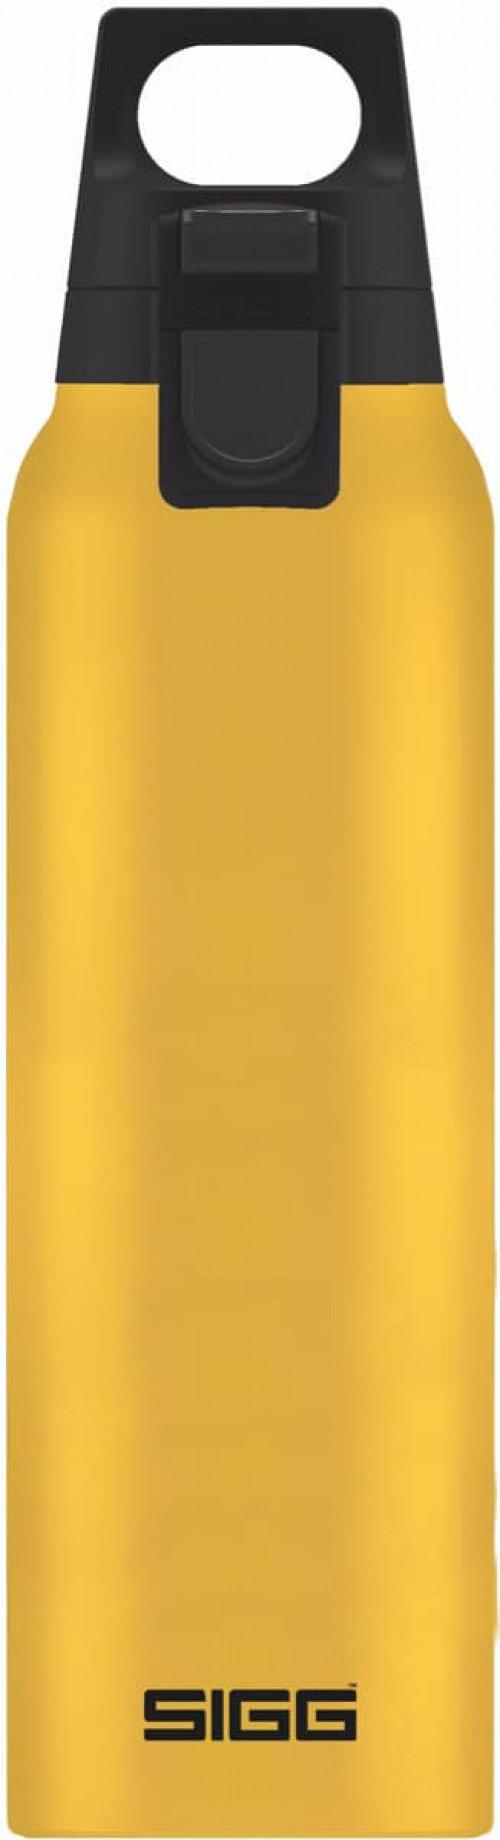 Sigg H&C One Mustard Mustard 0,5